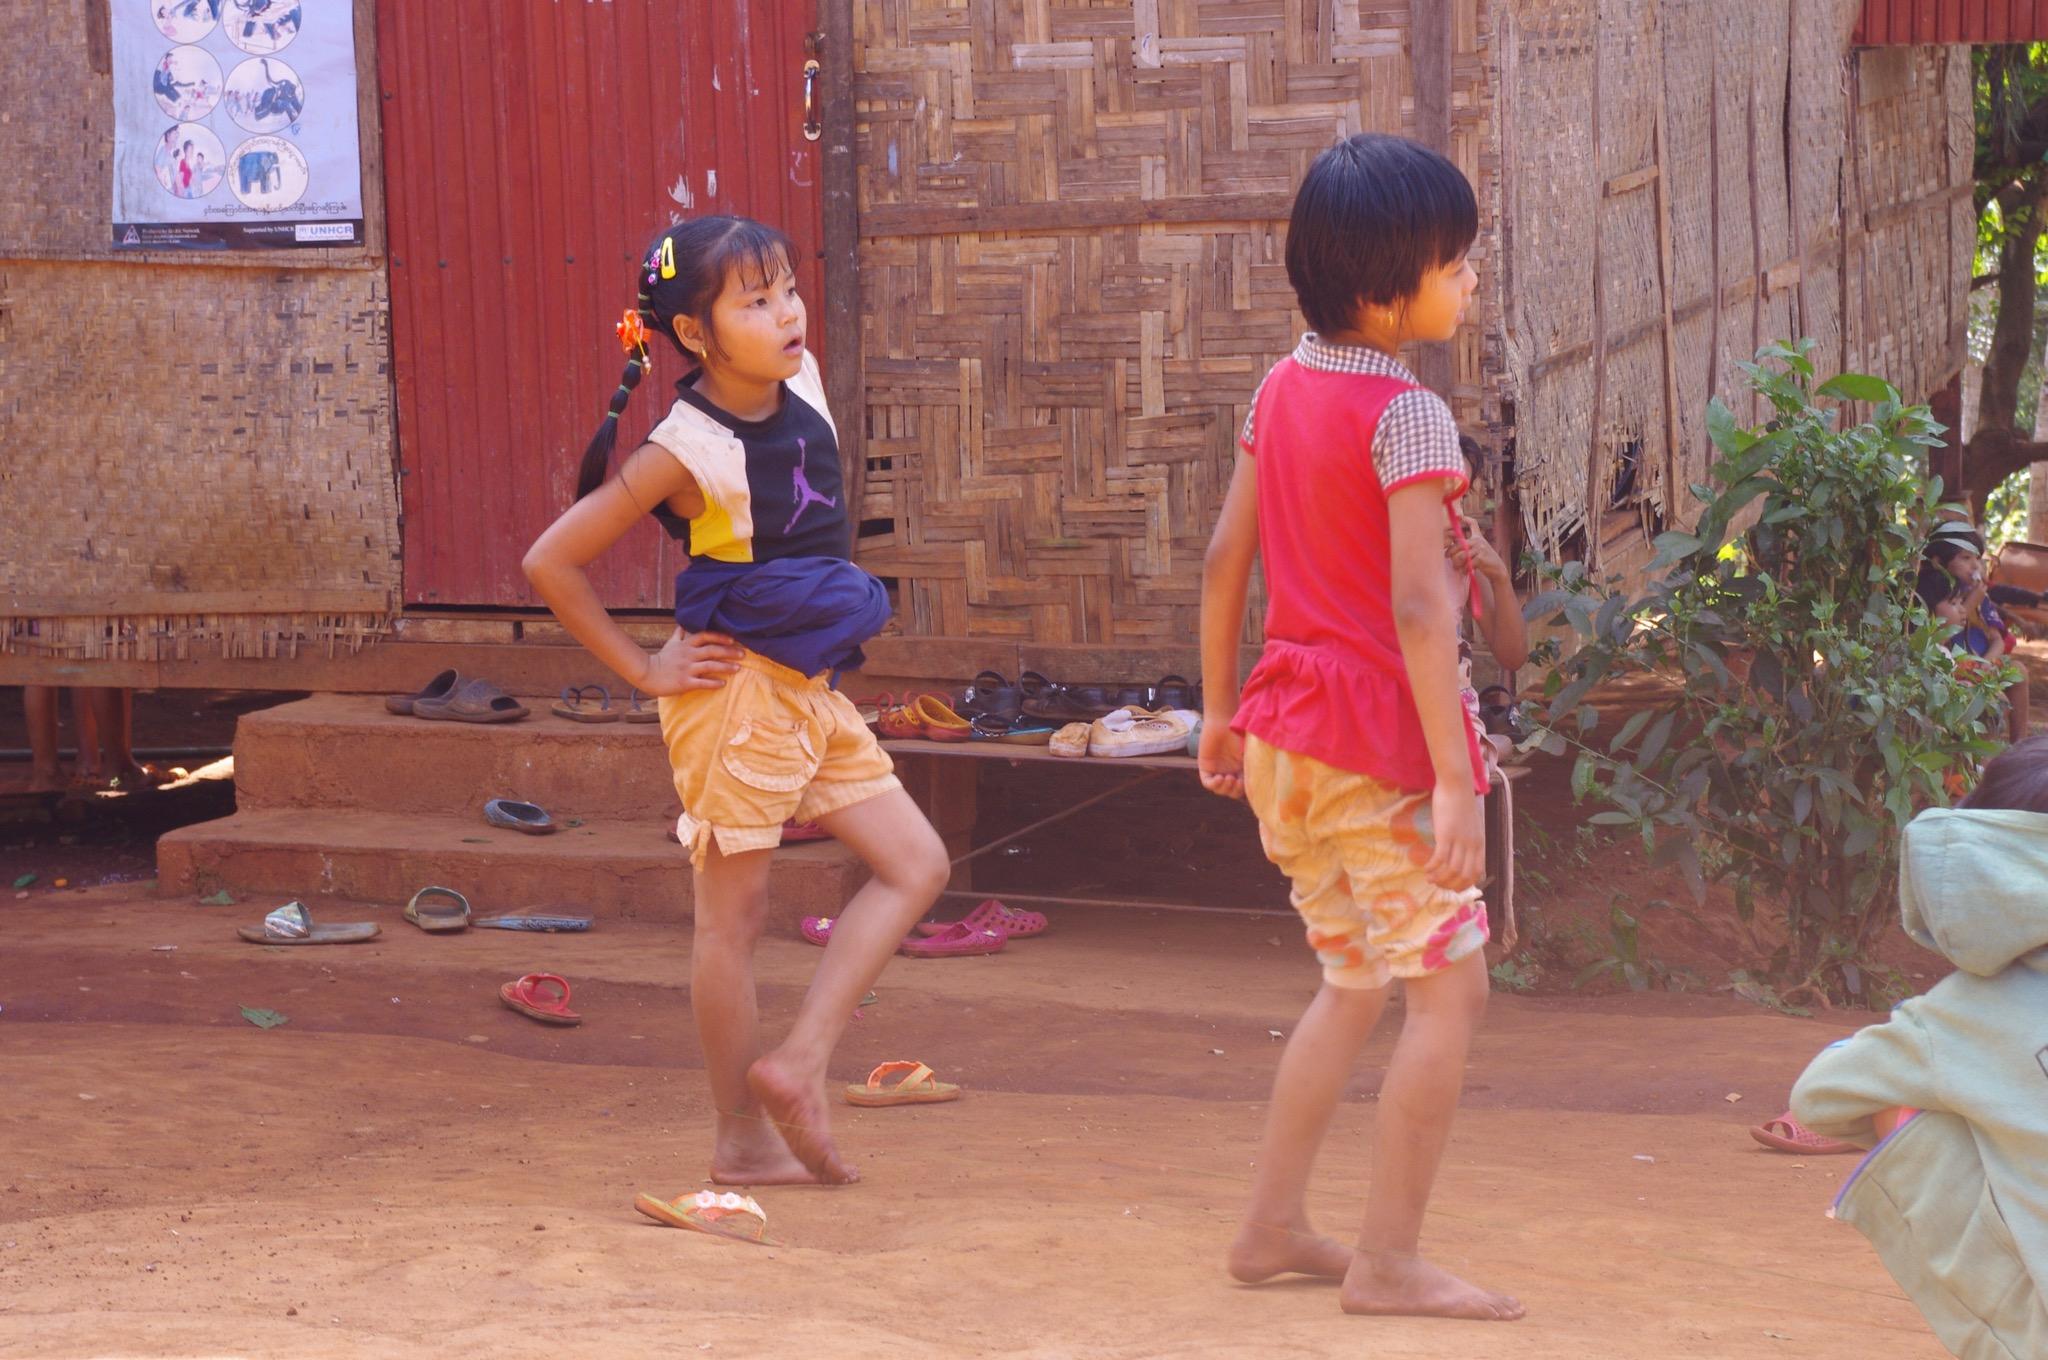 prostitutas en requena prostitutas en camboya